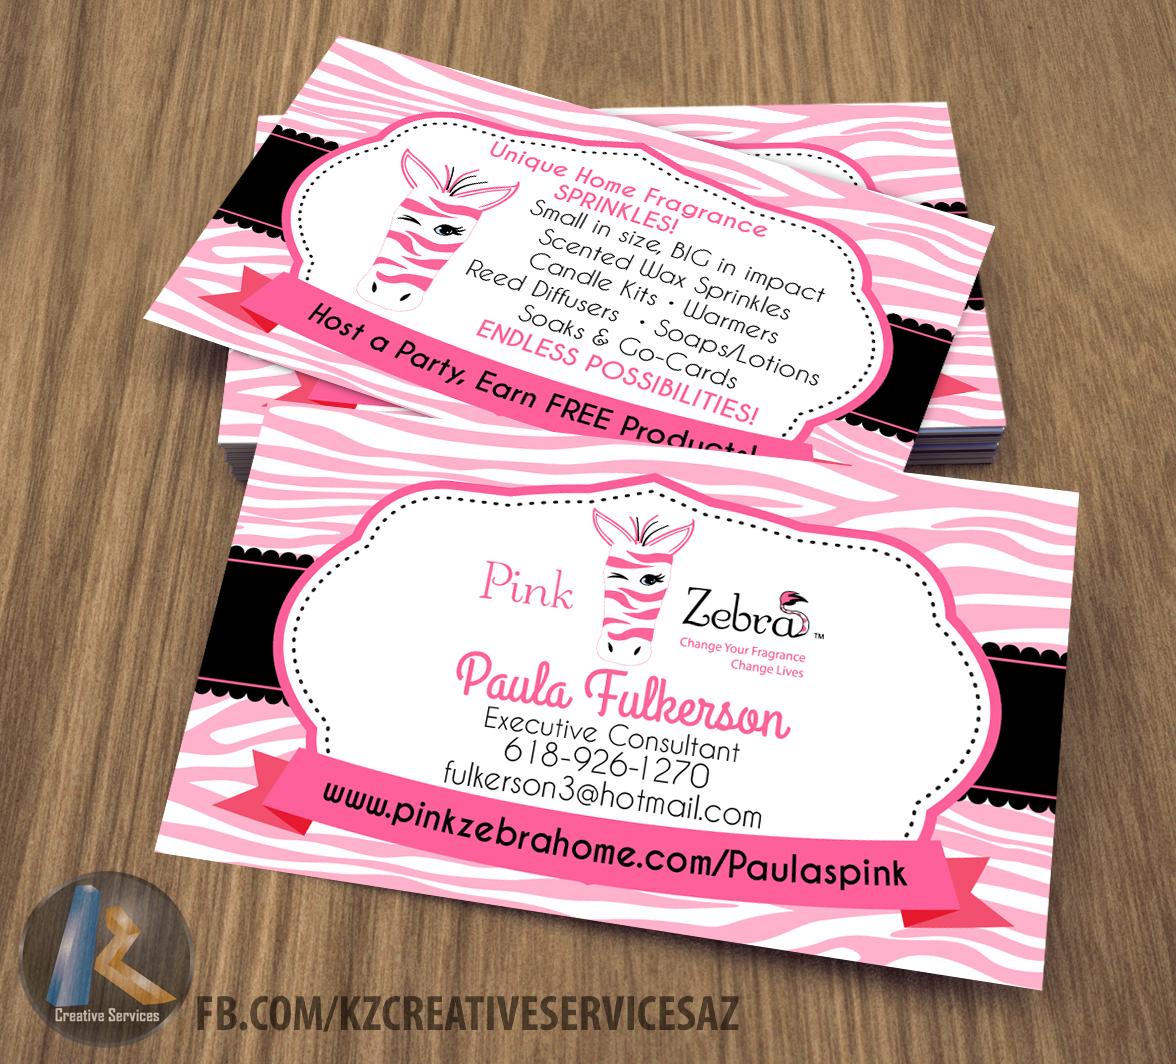 Pink zebra business cards style 4 kz creative services online pink zebra business cards style 4 colourmoves